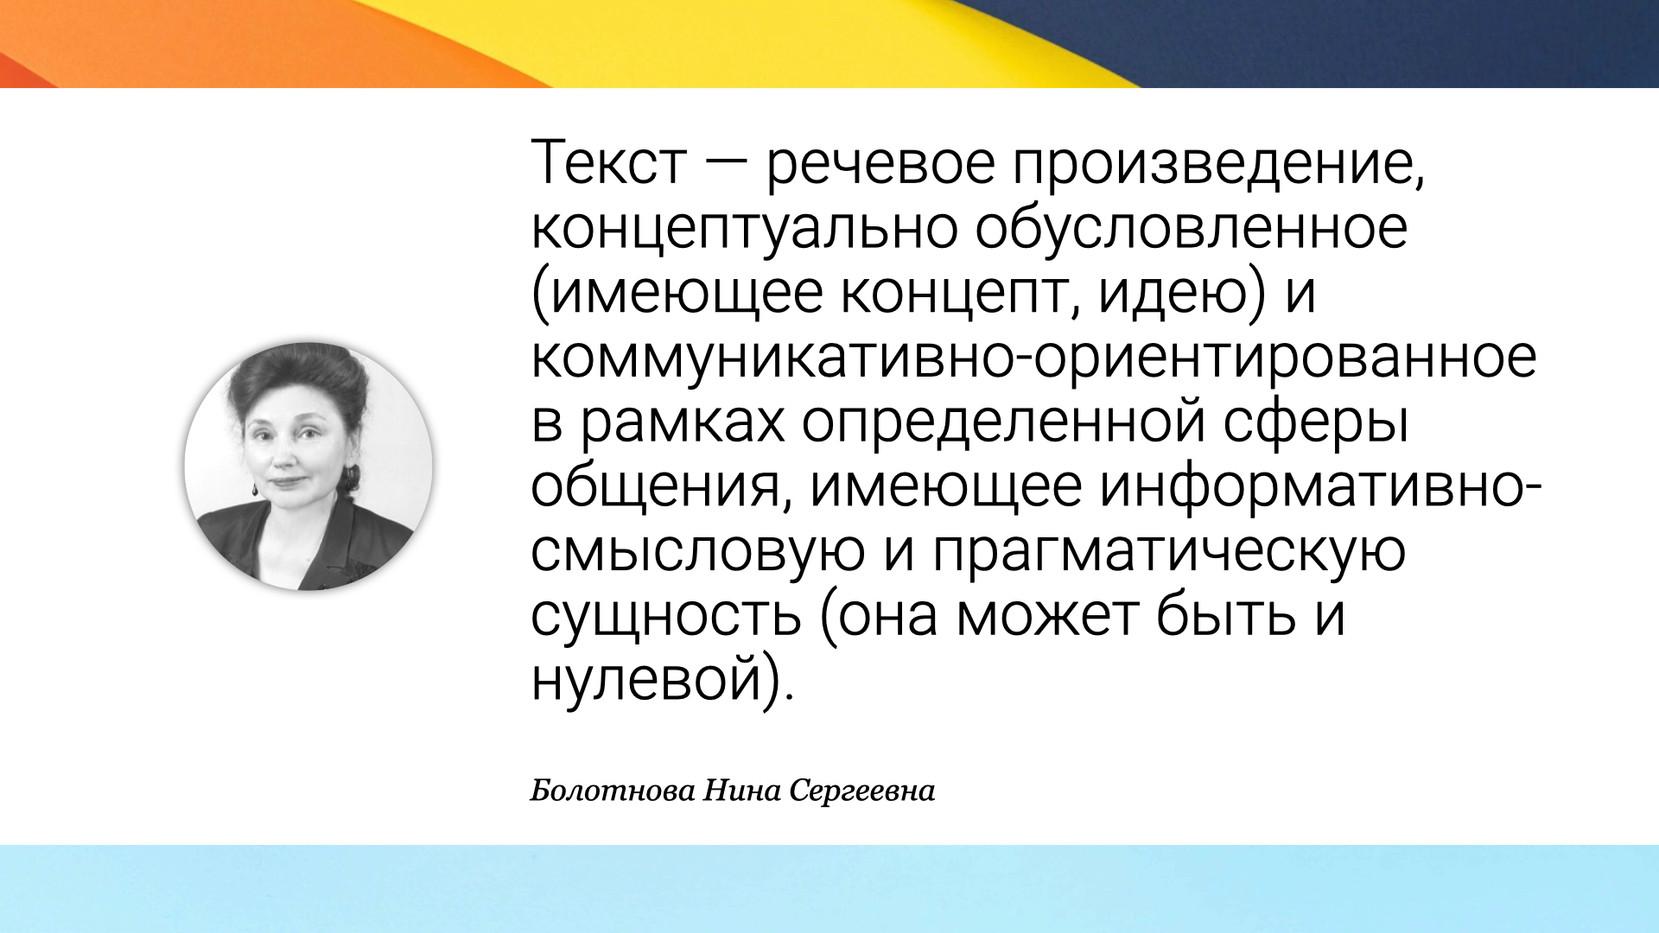 Болотнова Н.С.: